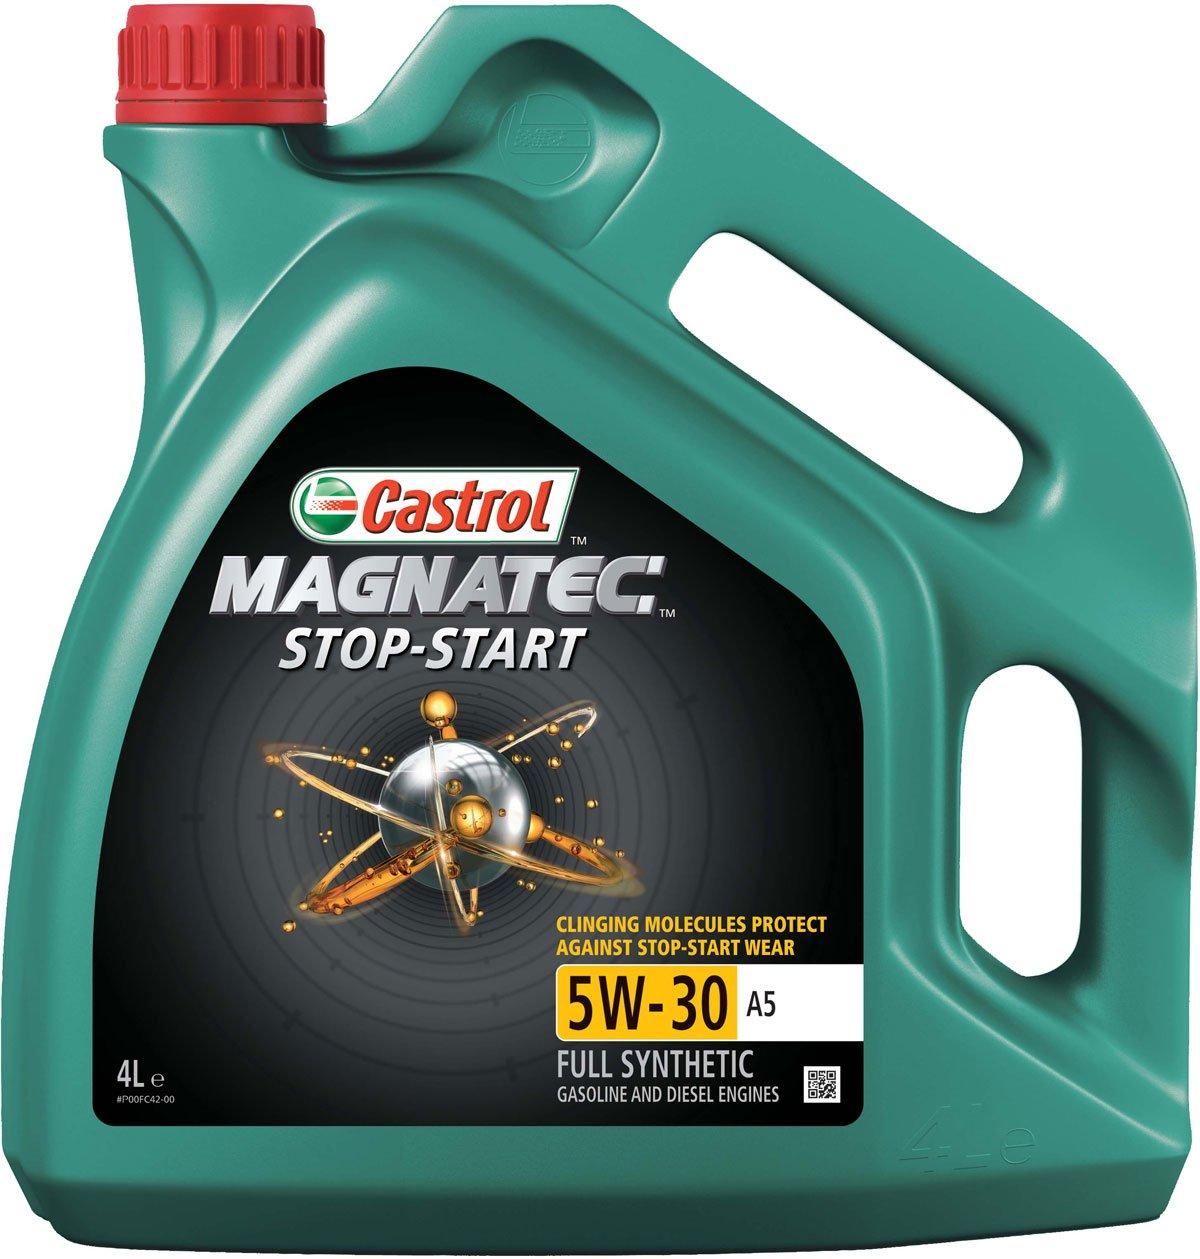 Castrol Magnatec Stop-Start A5 5w-30